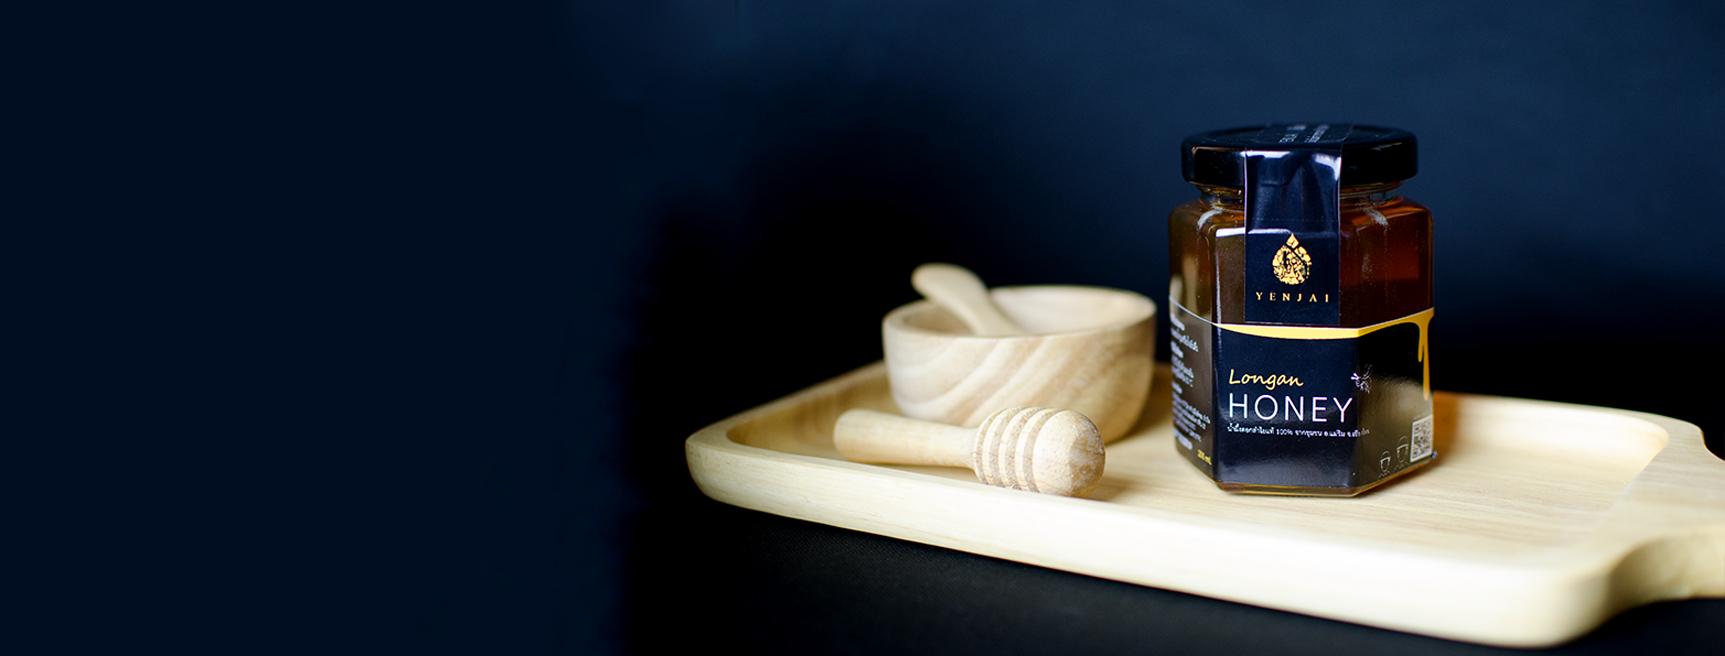 honey-yenjai-slide น้ำผึ้ง